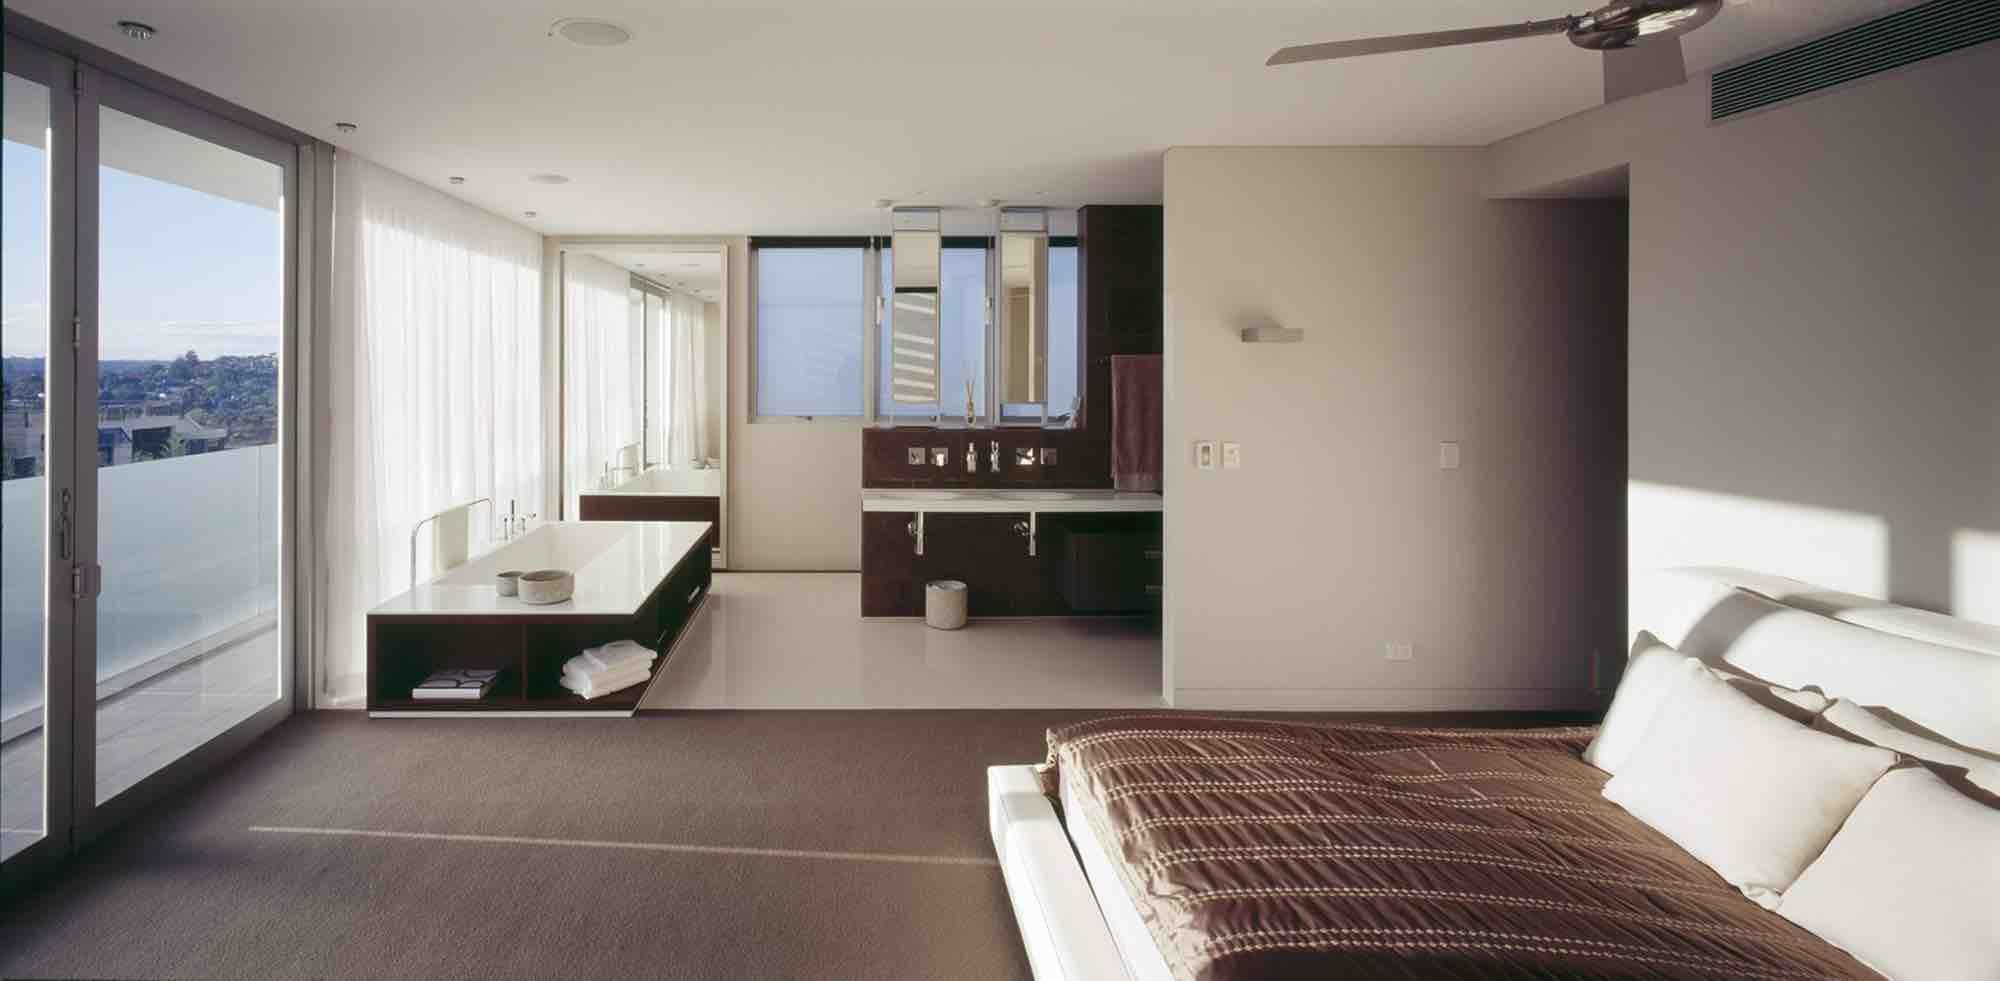 minosa-design-open-plan-ensuite-parents-retreat-dover-heights-portland-st-scooped-double-rifra-freestanding-corian-bath-shear-curtain-bathroom-01